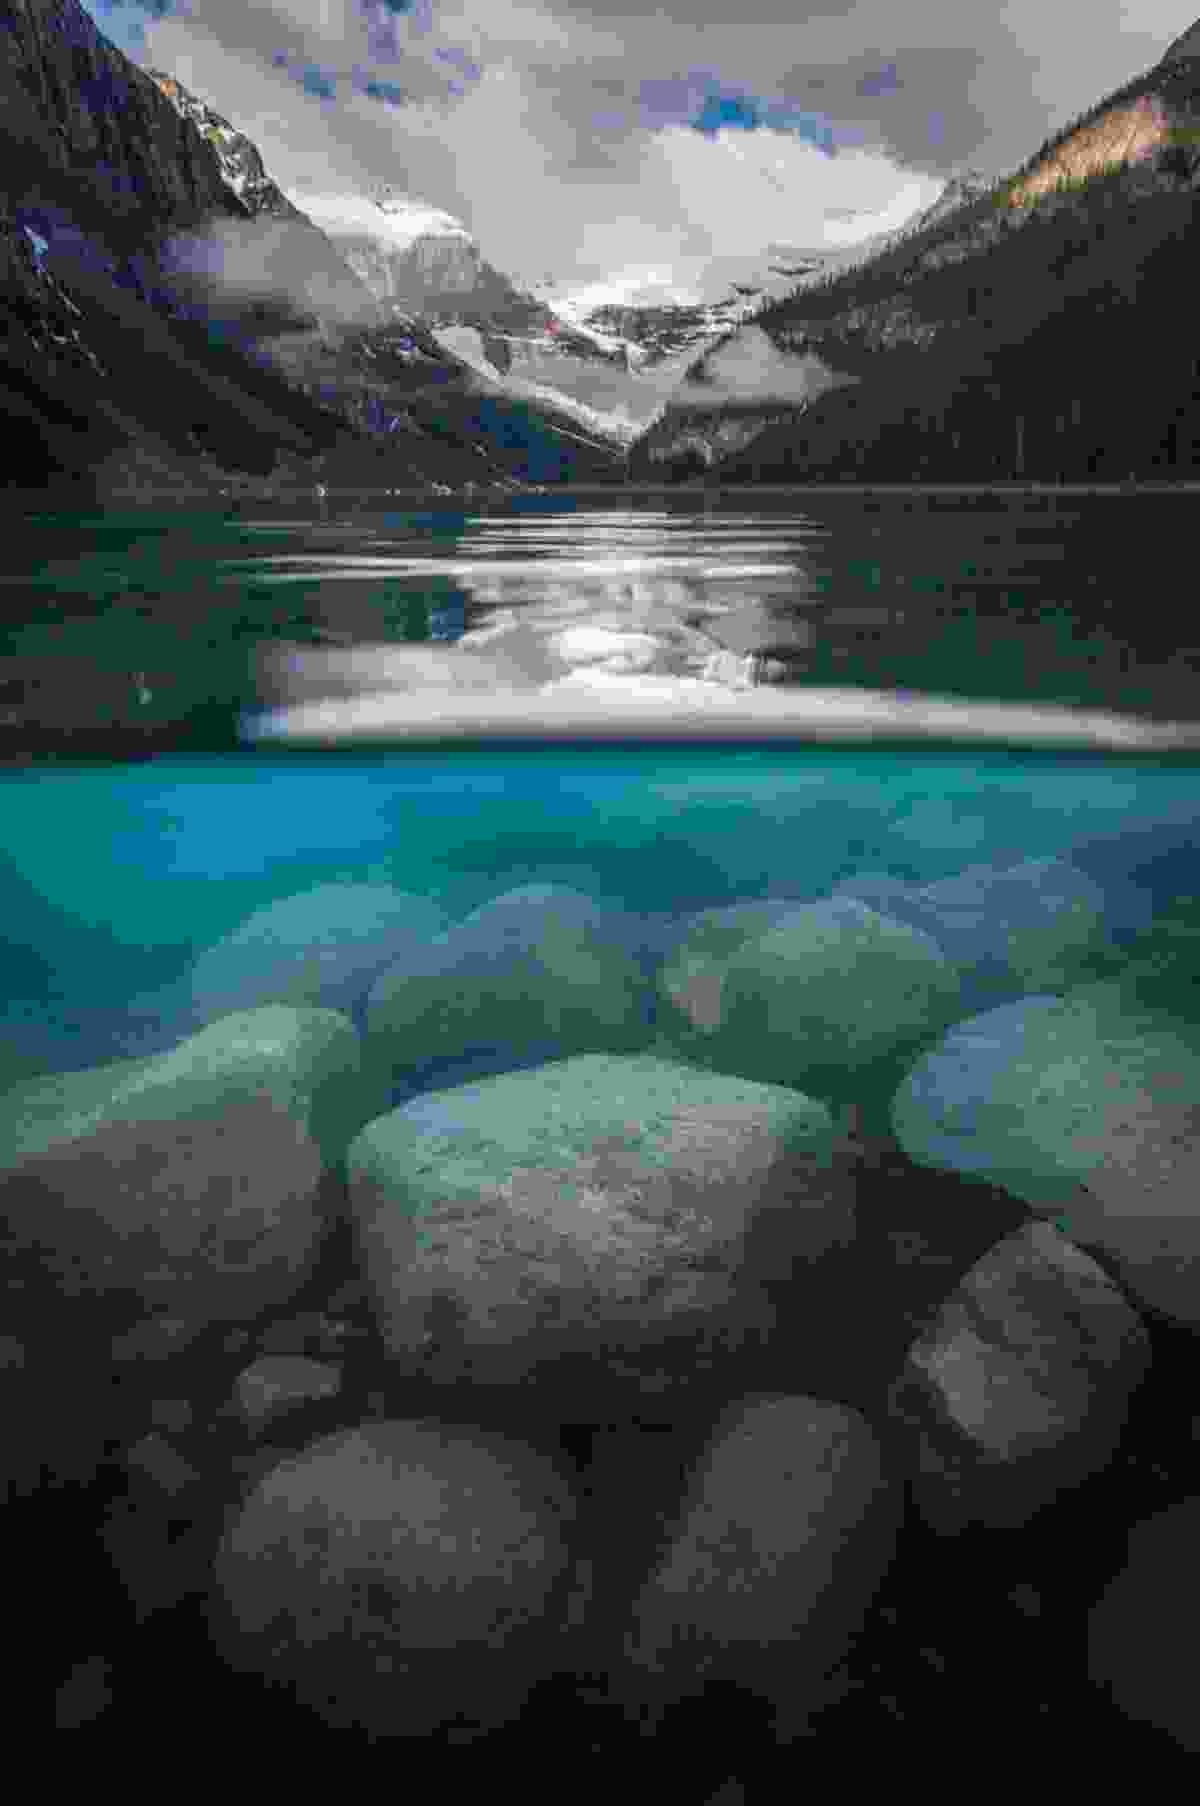 Underwater Look at Lake Louise (Paul Zizka)